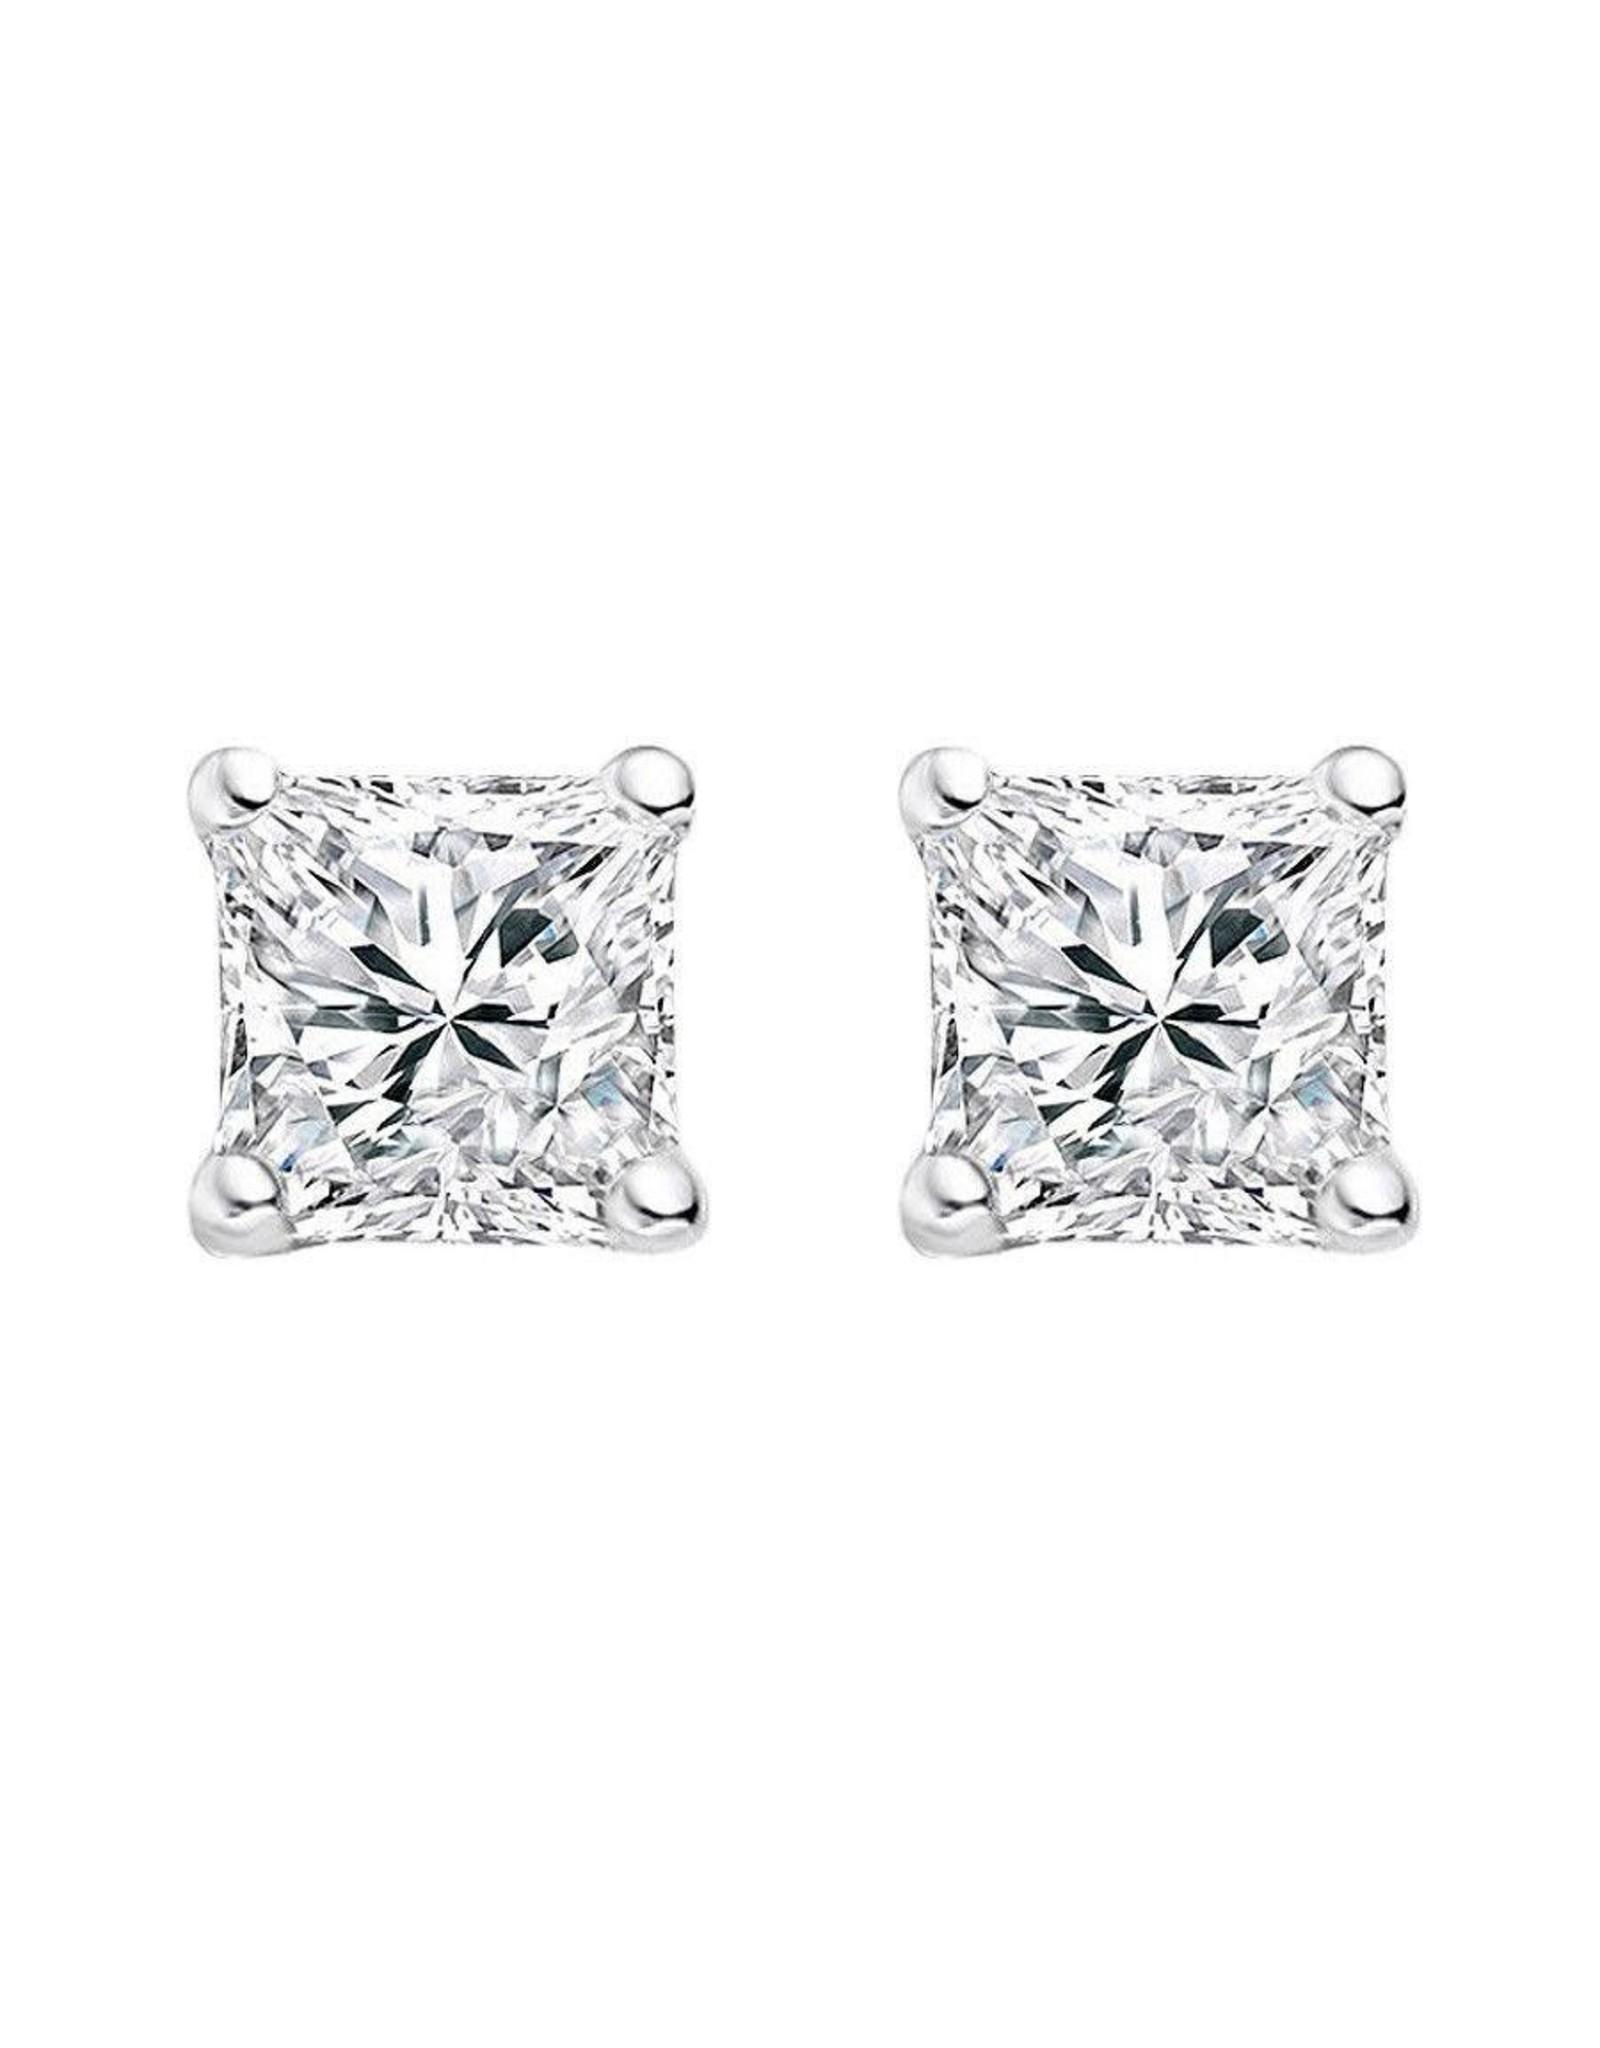 18K White Gold Princess Cut Diamond Stud Earrings, D: 1.90 cts